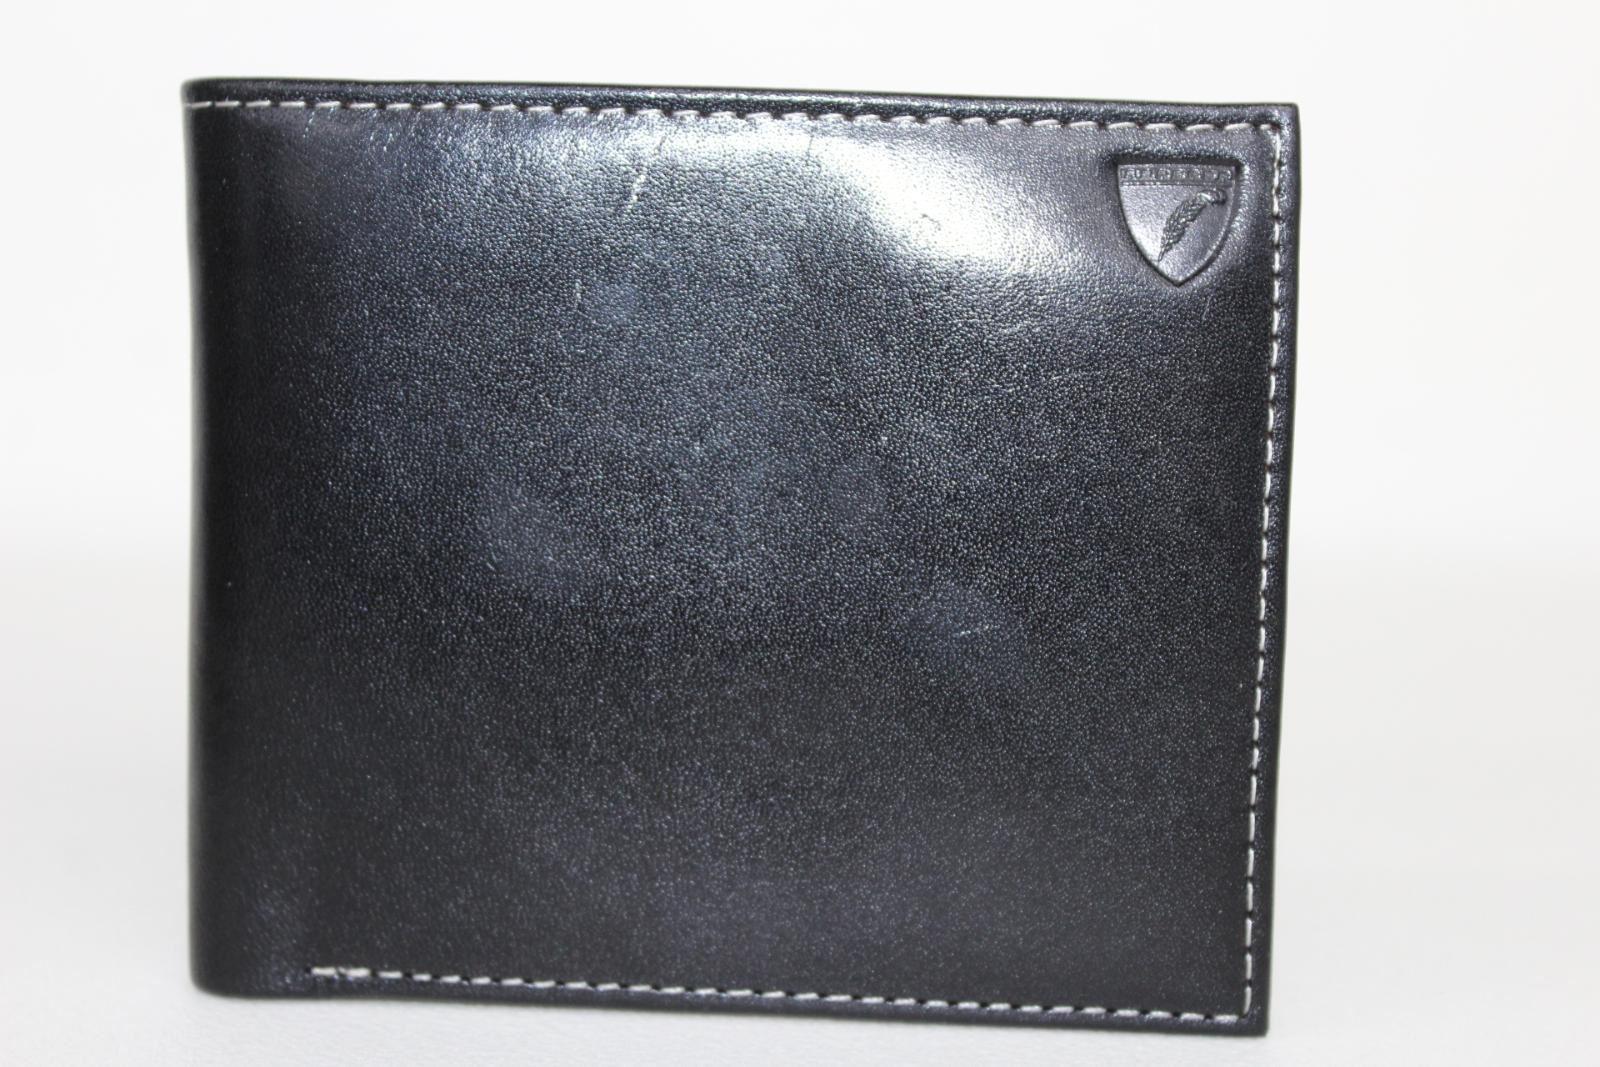 ASPINAL-OF-LONDON-Calf-Smooth-Black-amp-Cobalt-Blue-Snake-Exotic-Billfold-Wallet